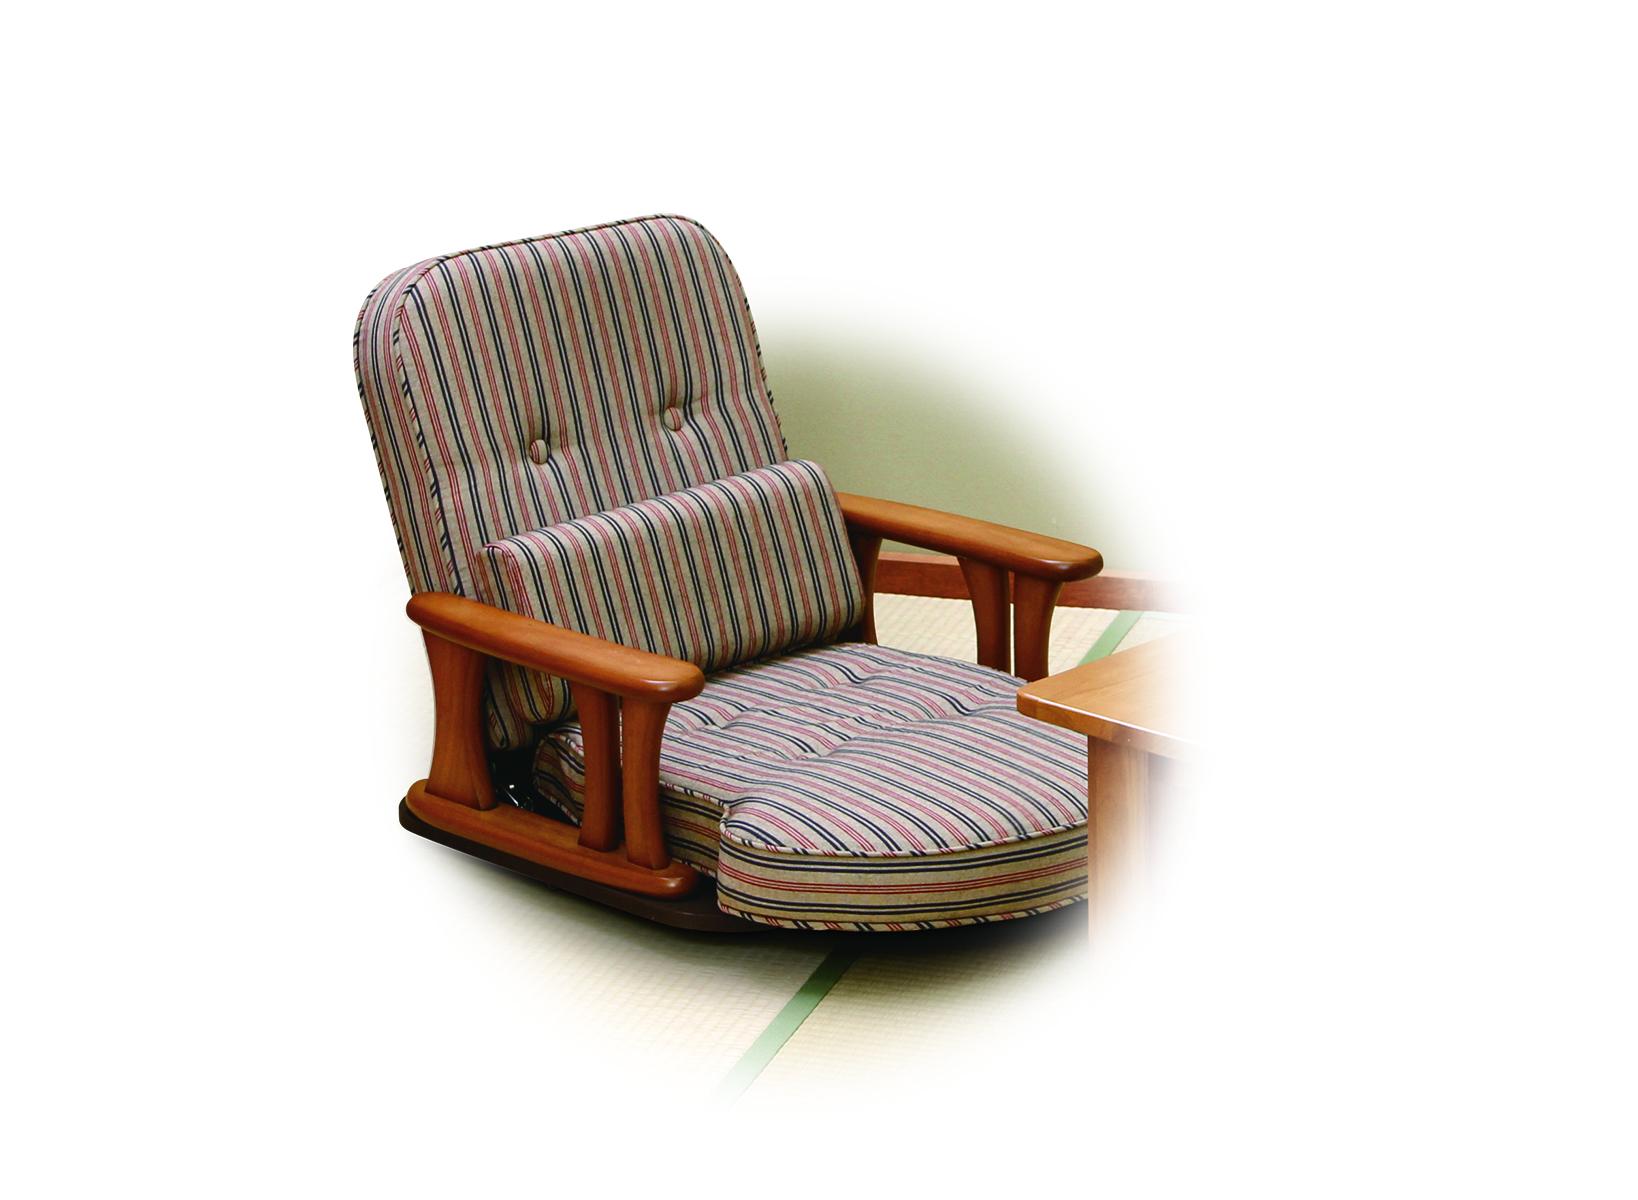 [NK-2200]回転肘付き座椅子 4段階調整